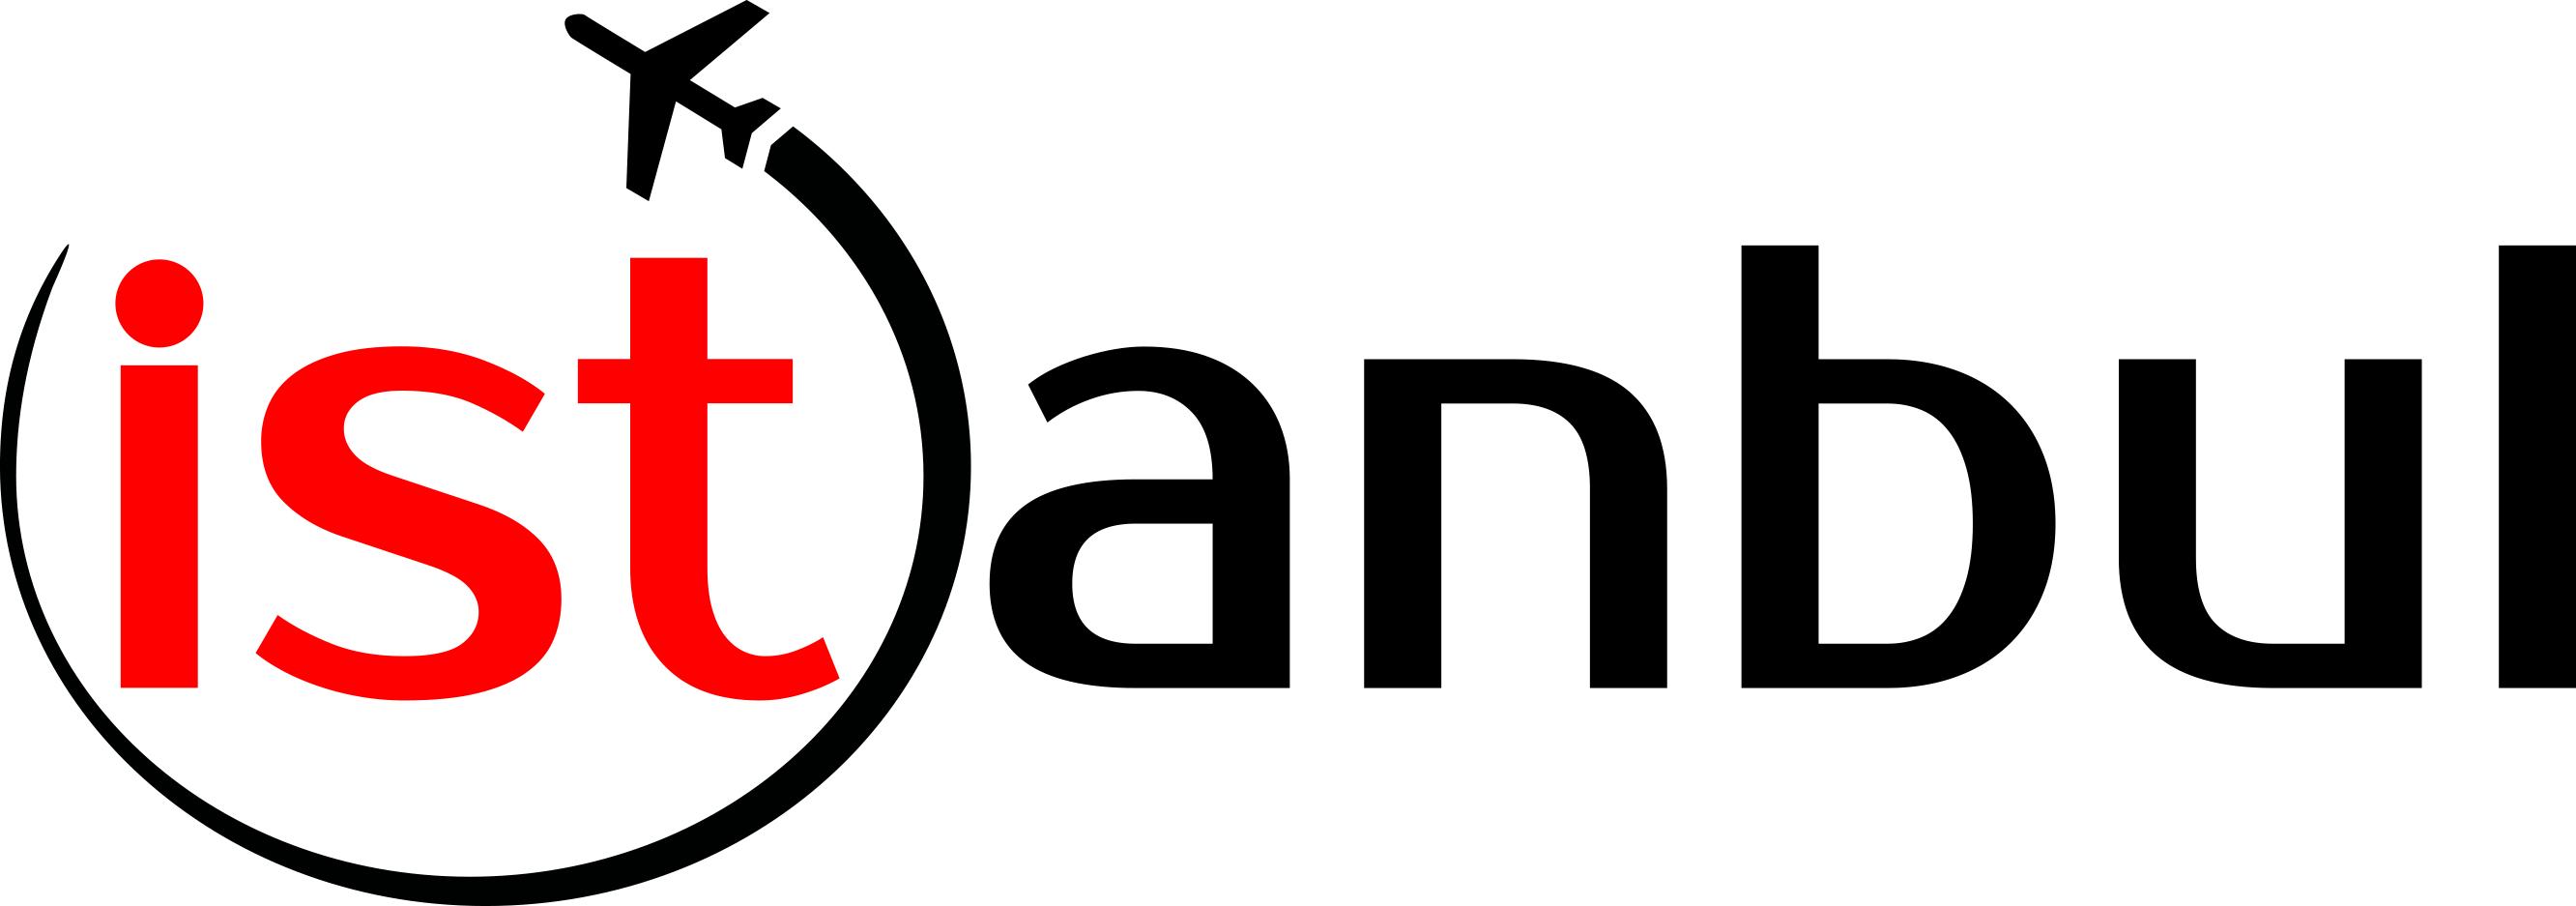 istanbul-international-airport.com logo